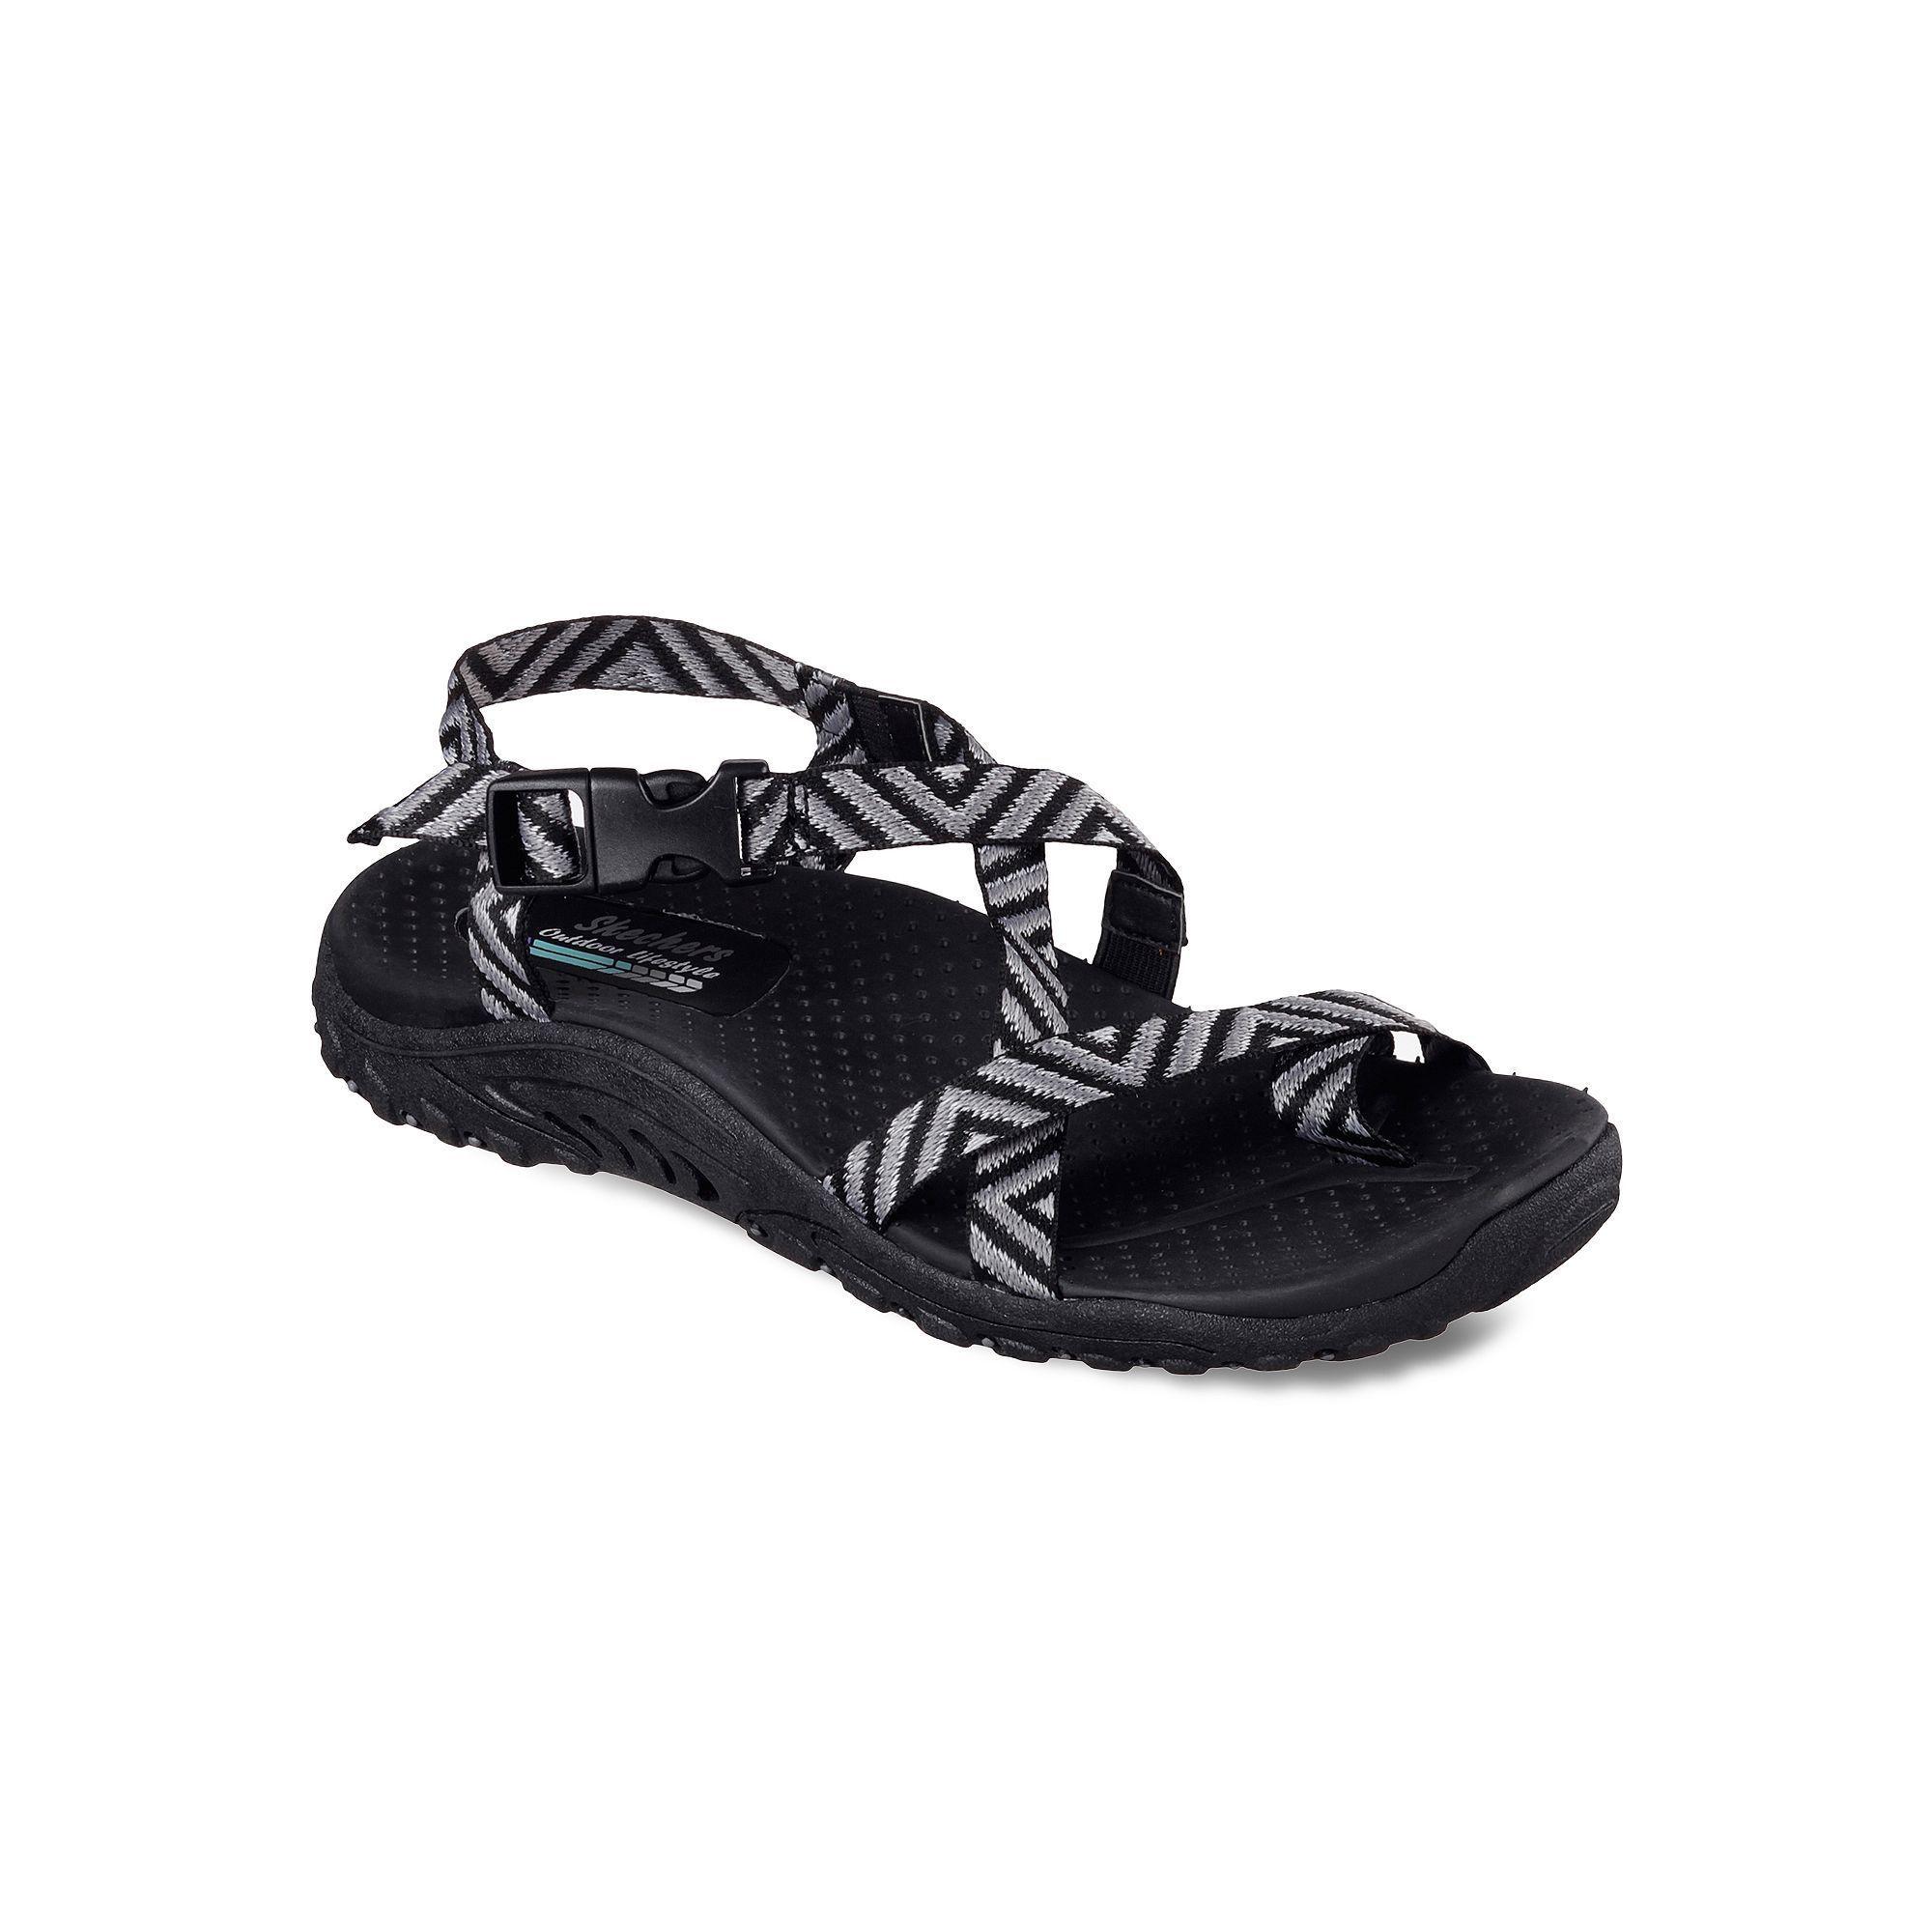 e6ae99d595e2 Skechers Reggae Haystack Women s River Sandals